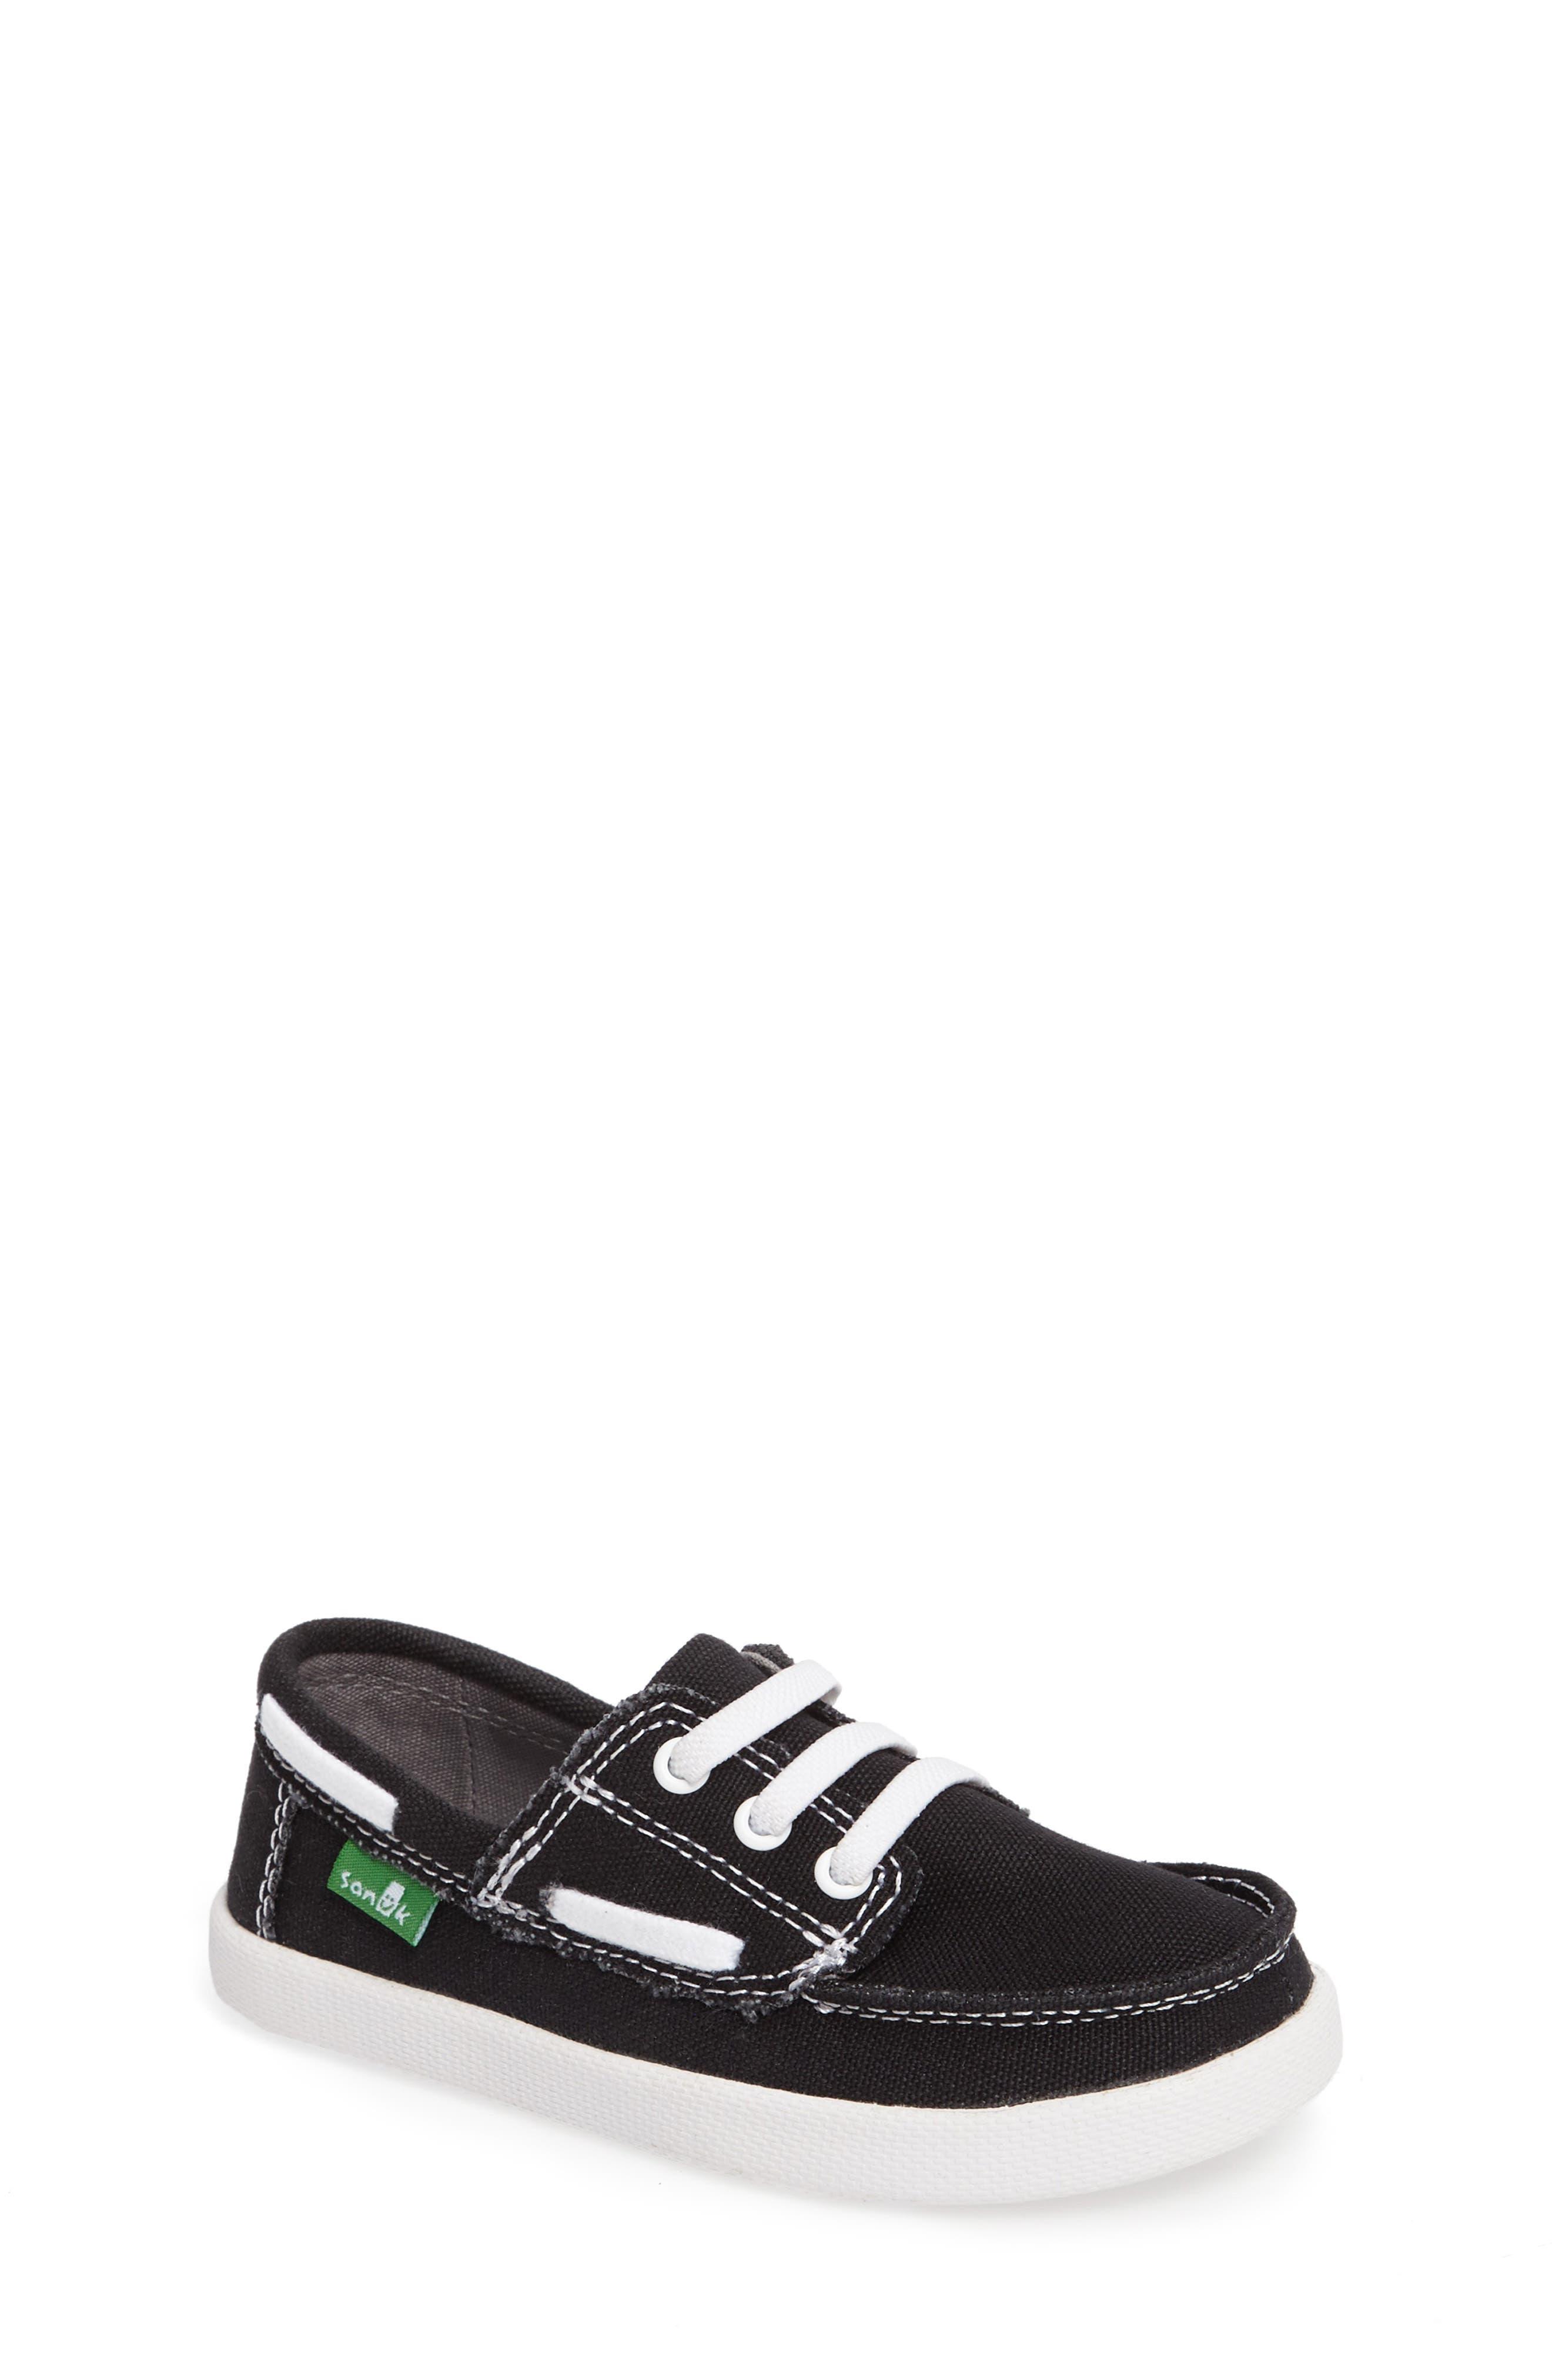 Lil Deck Hand Slip-On Sneaker,                         Main,                         color, 001